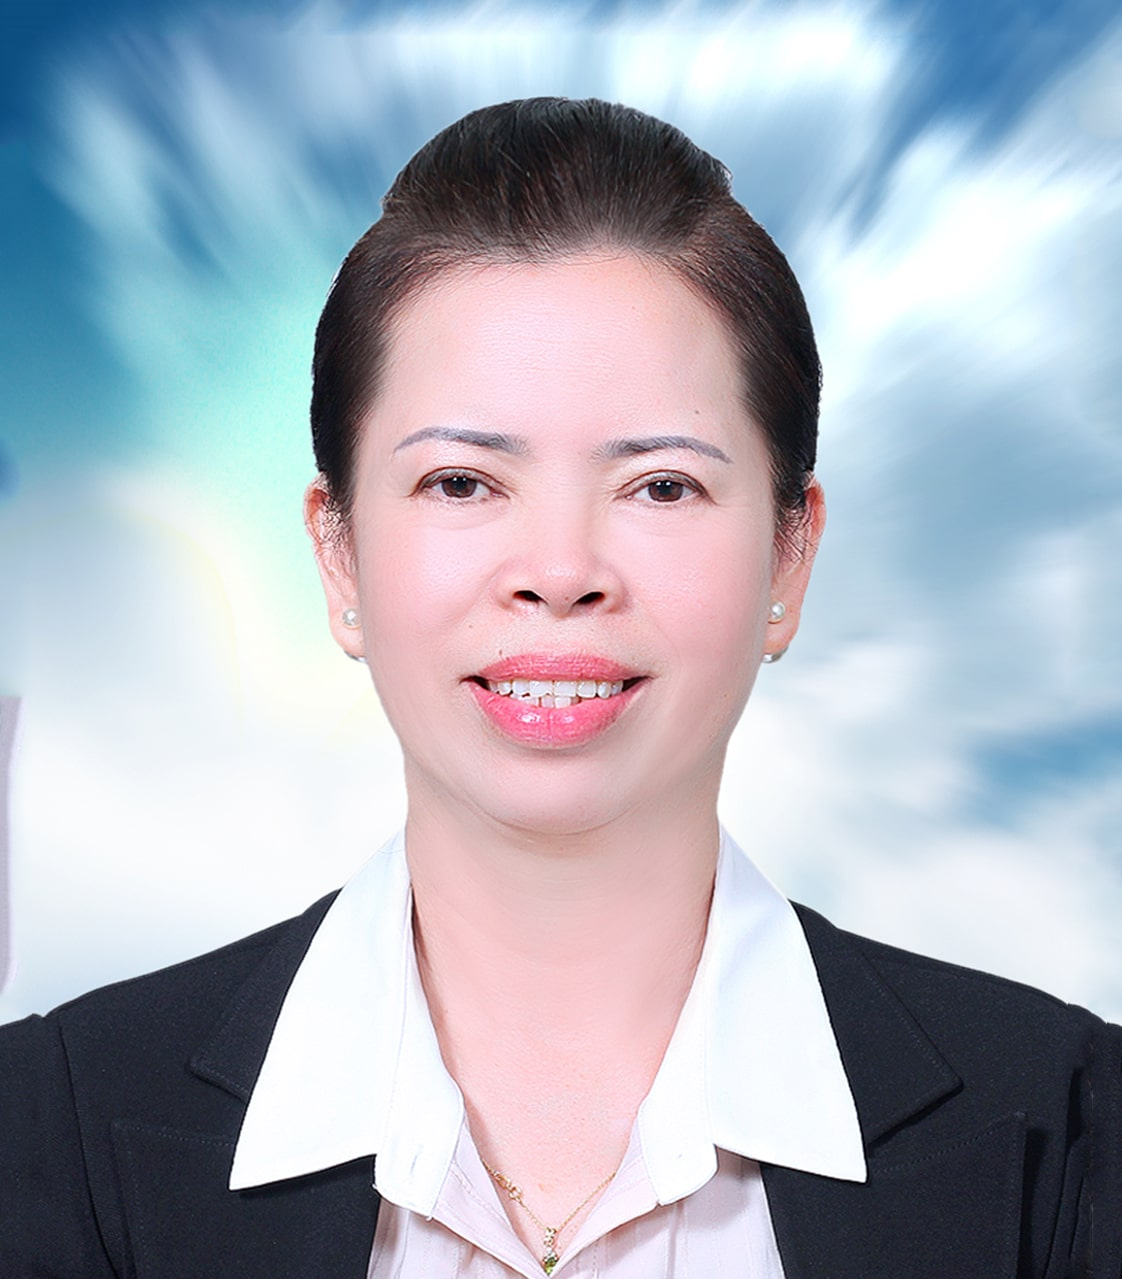 Ms. Nguyen Thi Tuyet